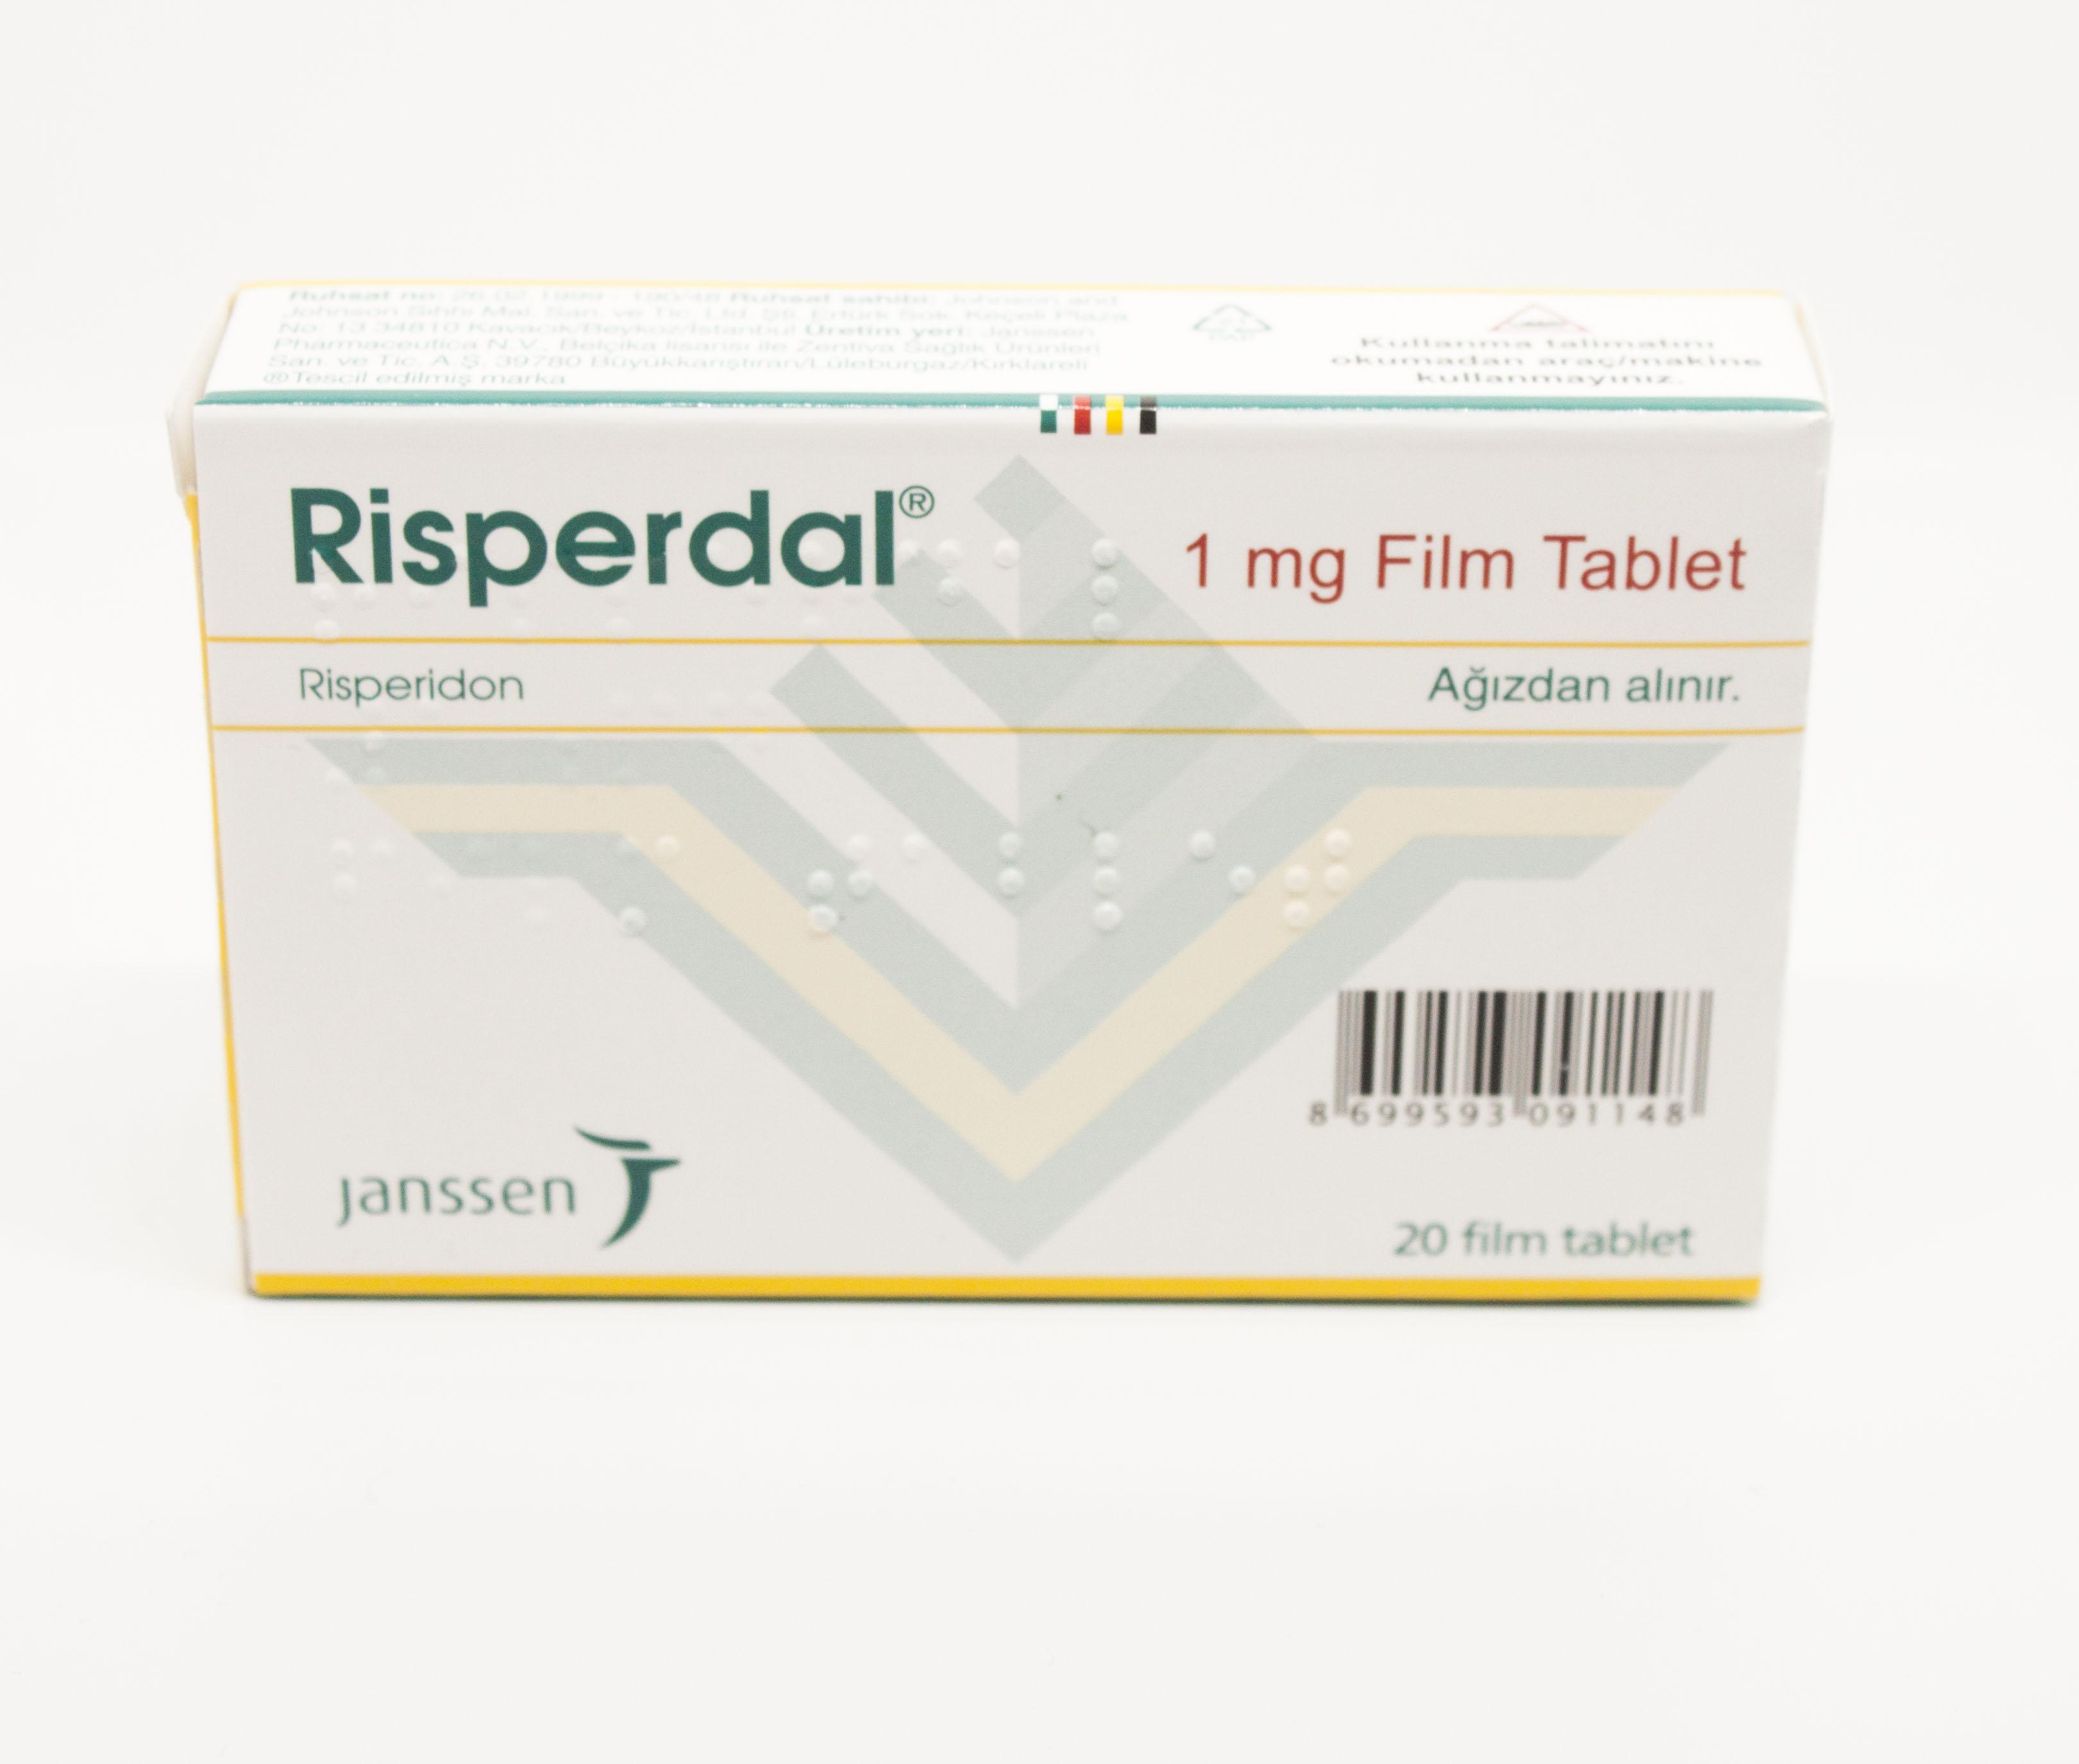 risperdal-1-mg-20-tablet-kilo-aldirir-mi